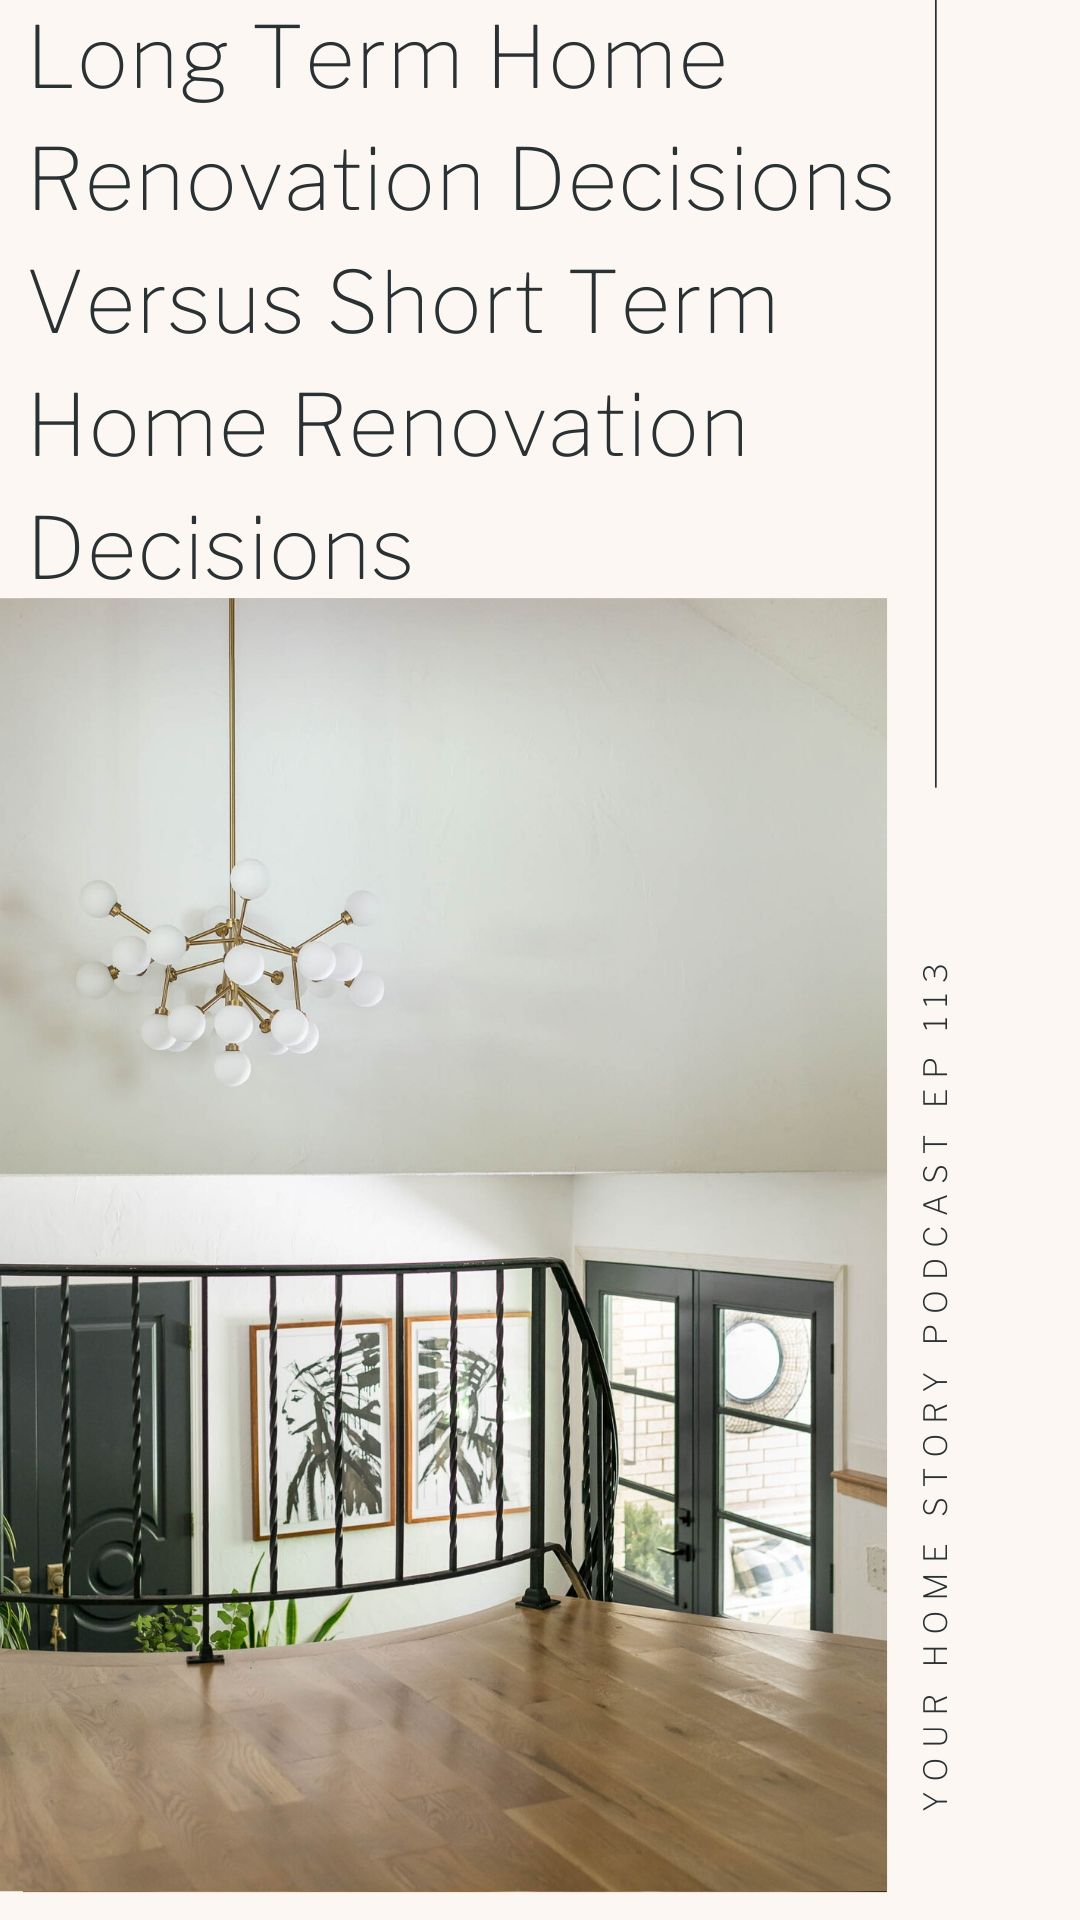 Long Term renovation decisions